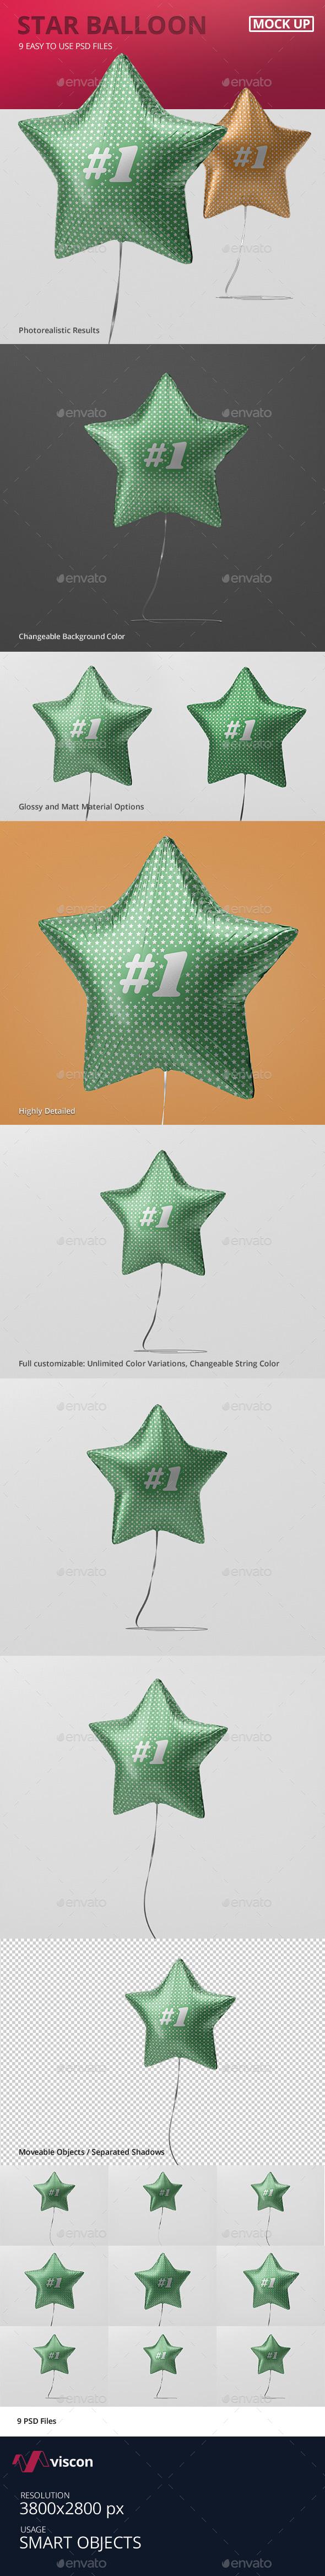 Star Balloon Mockup - Miscellaneous Print